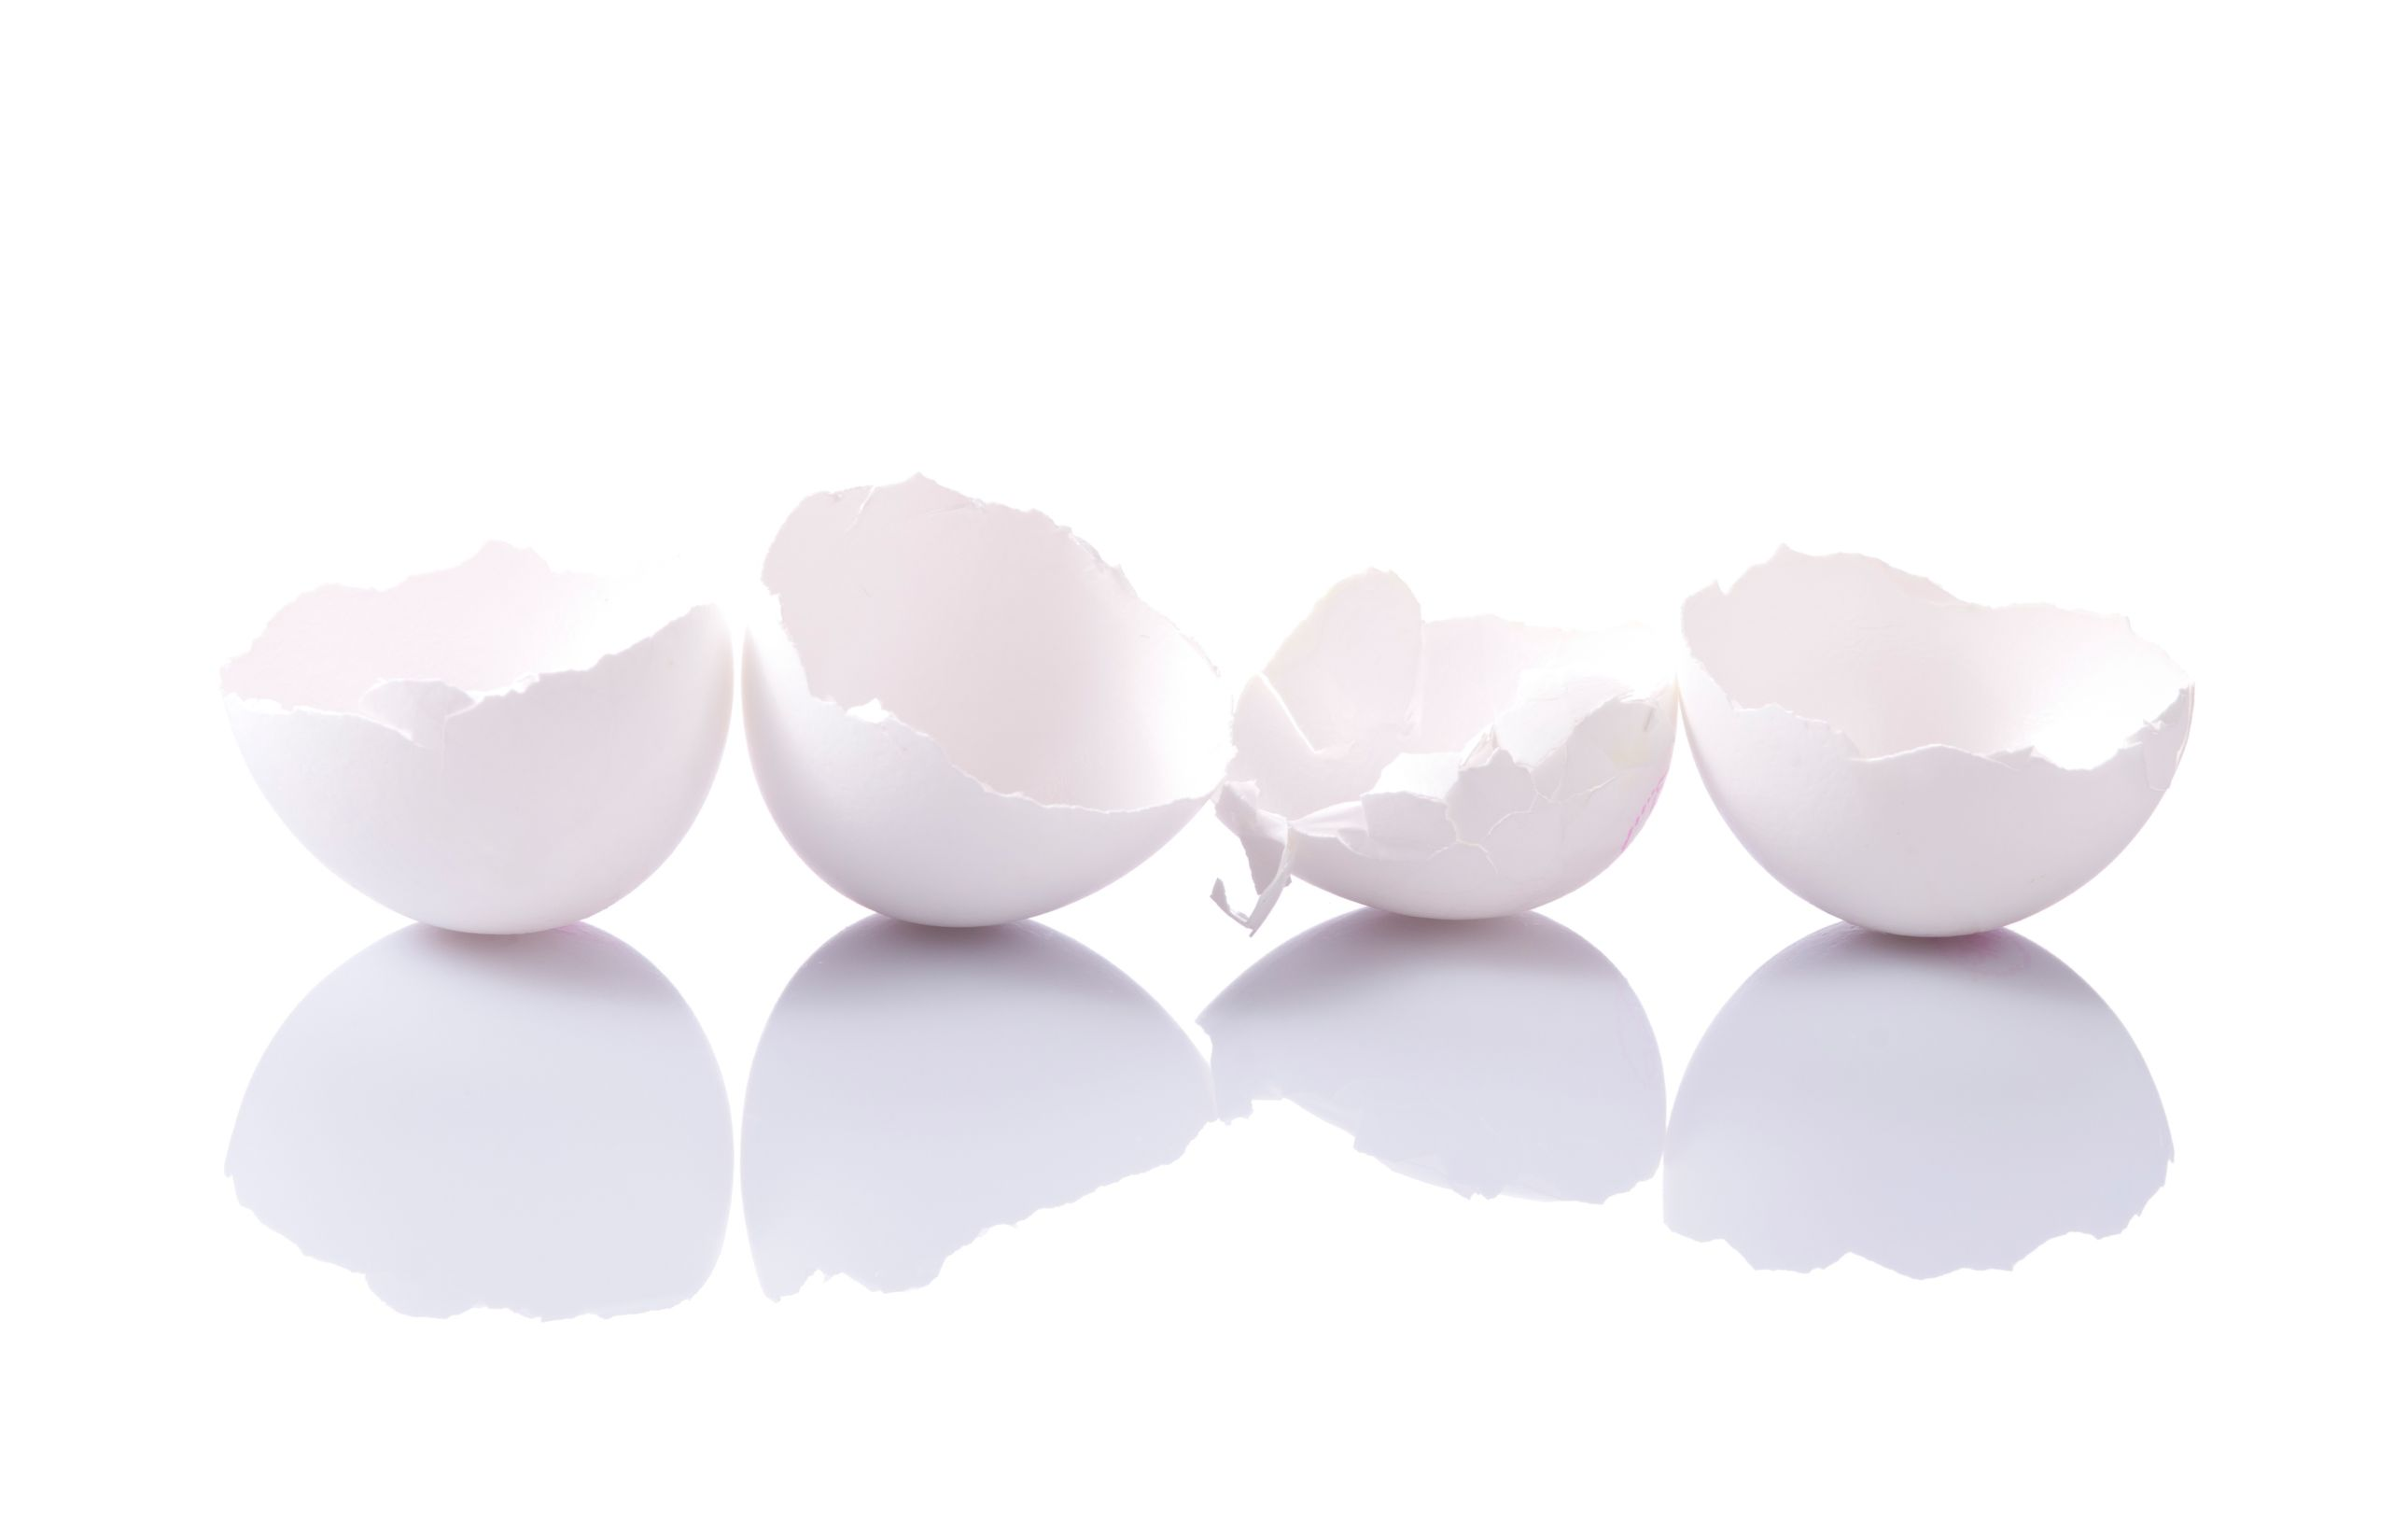 Sweeping Away the Eggshells